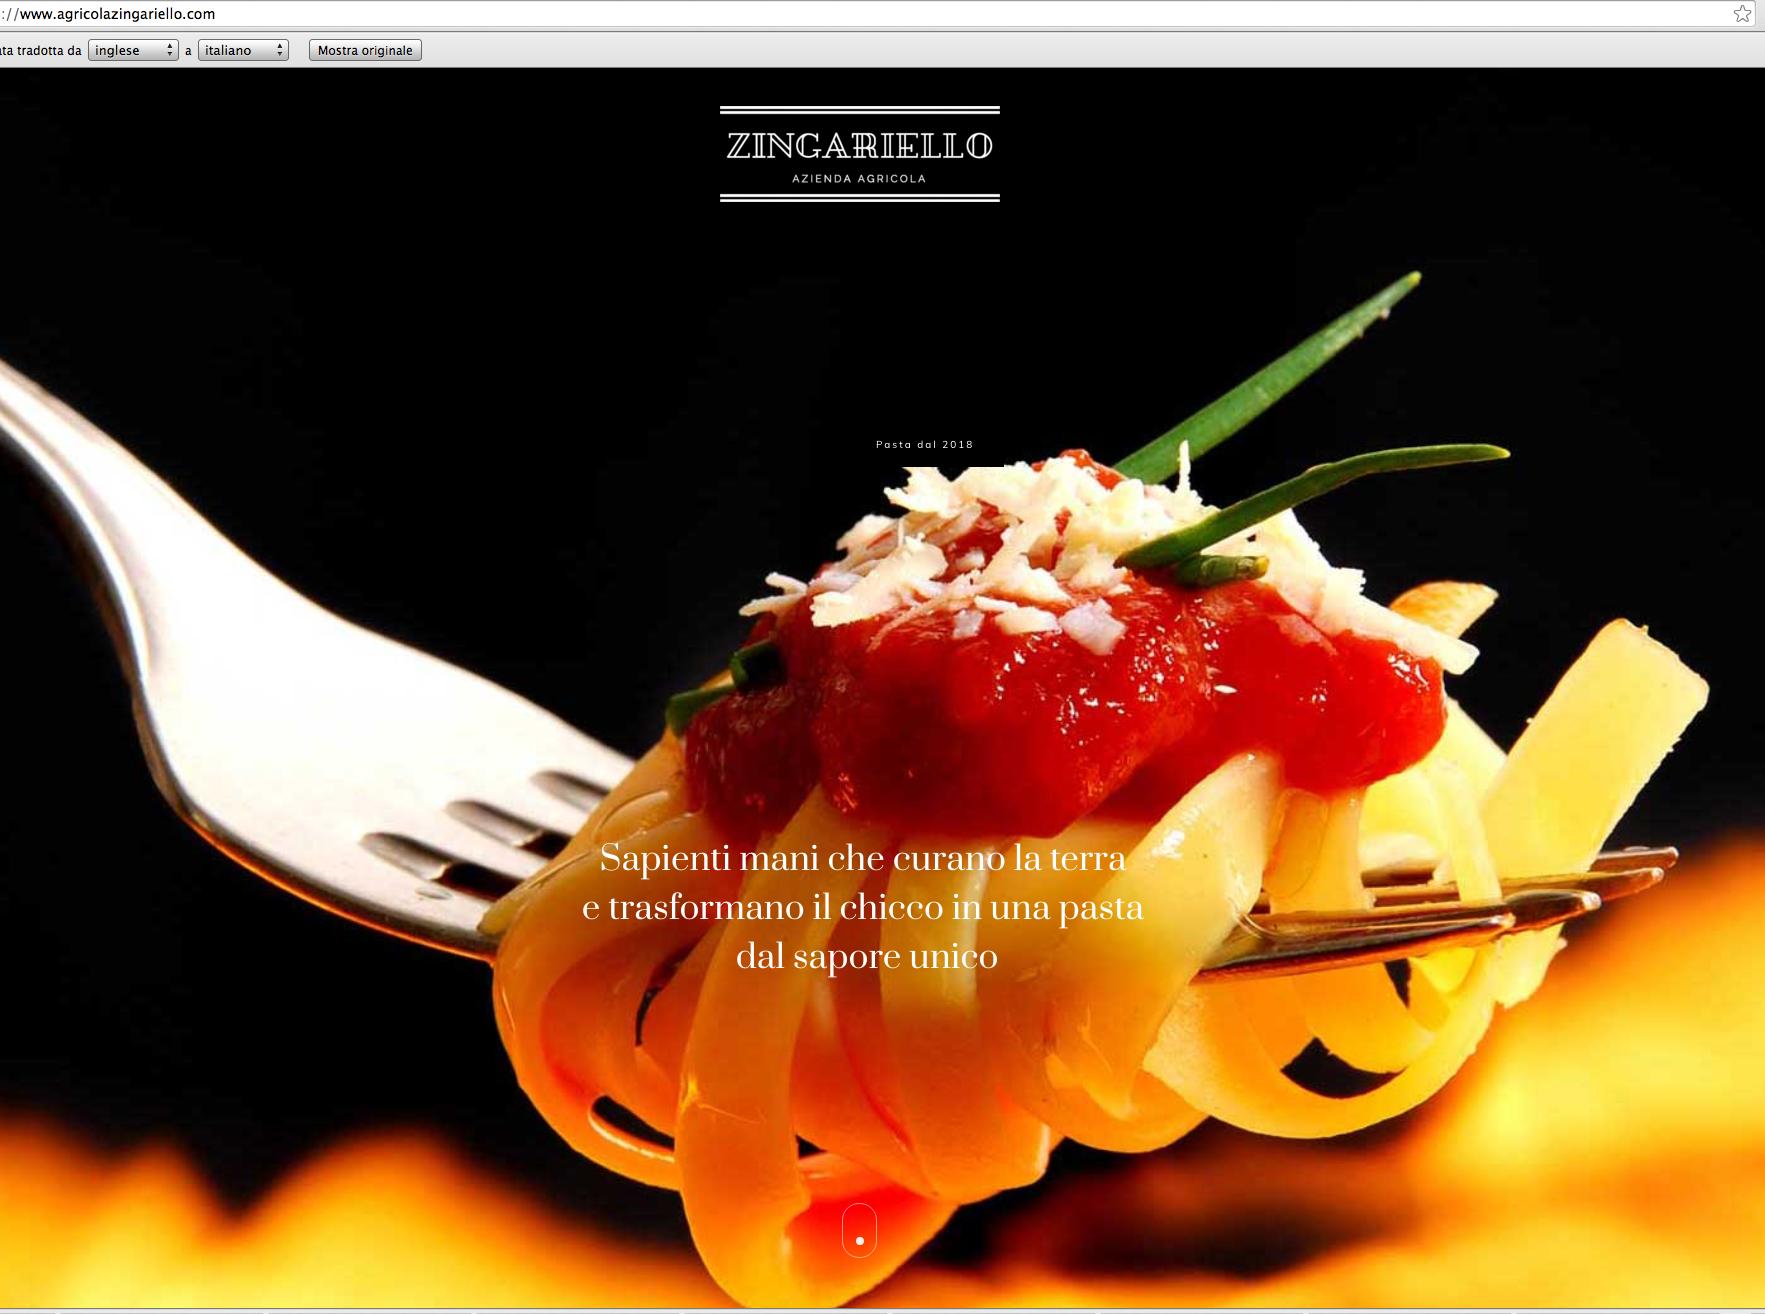 website – agricolazingariello.com